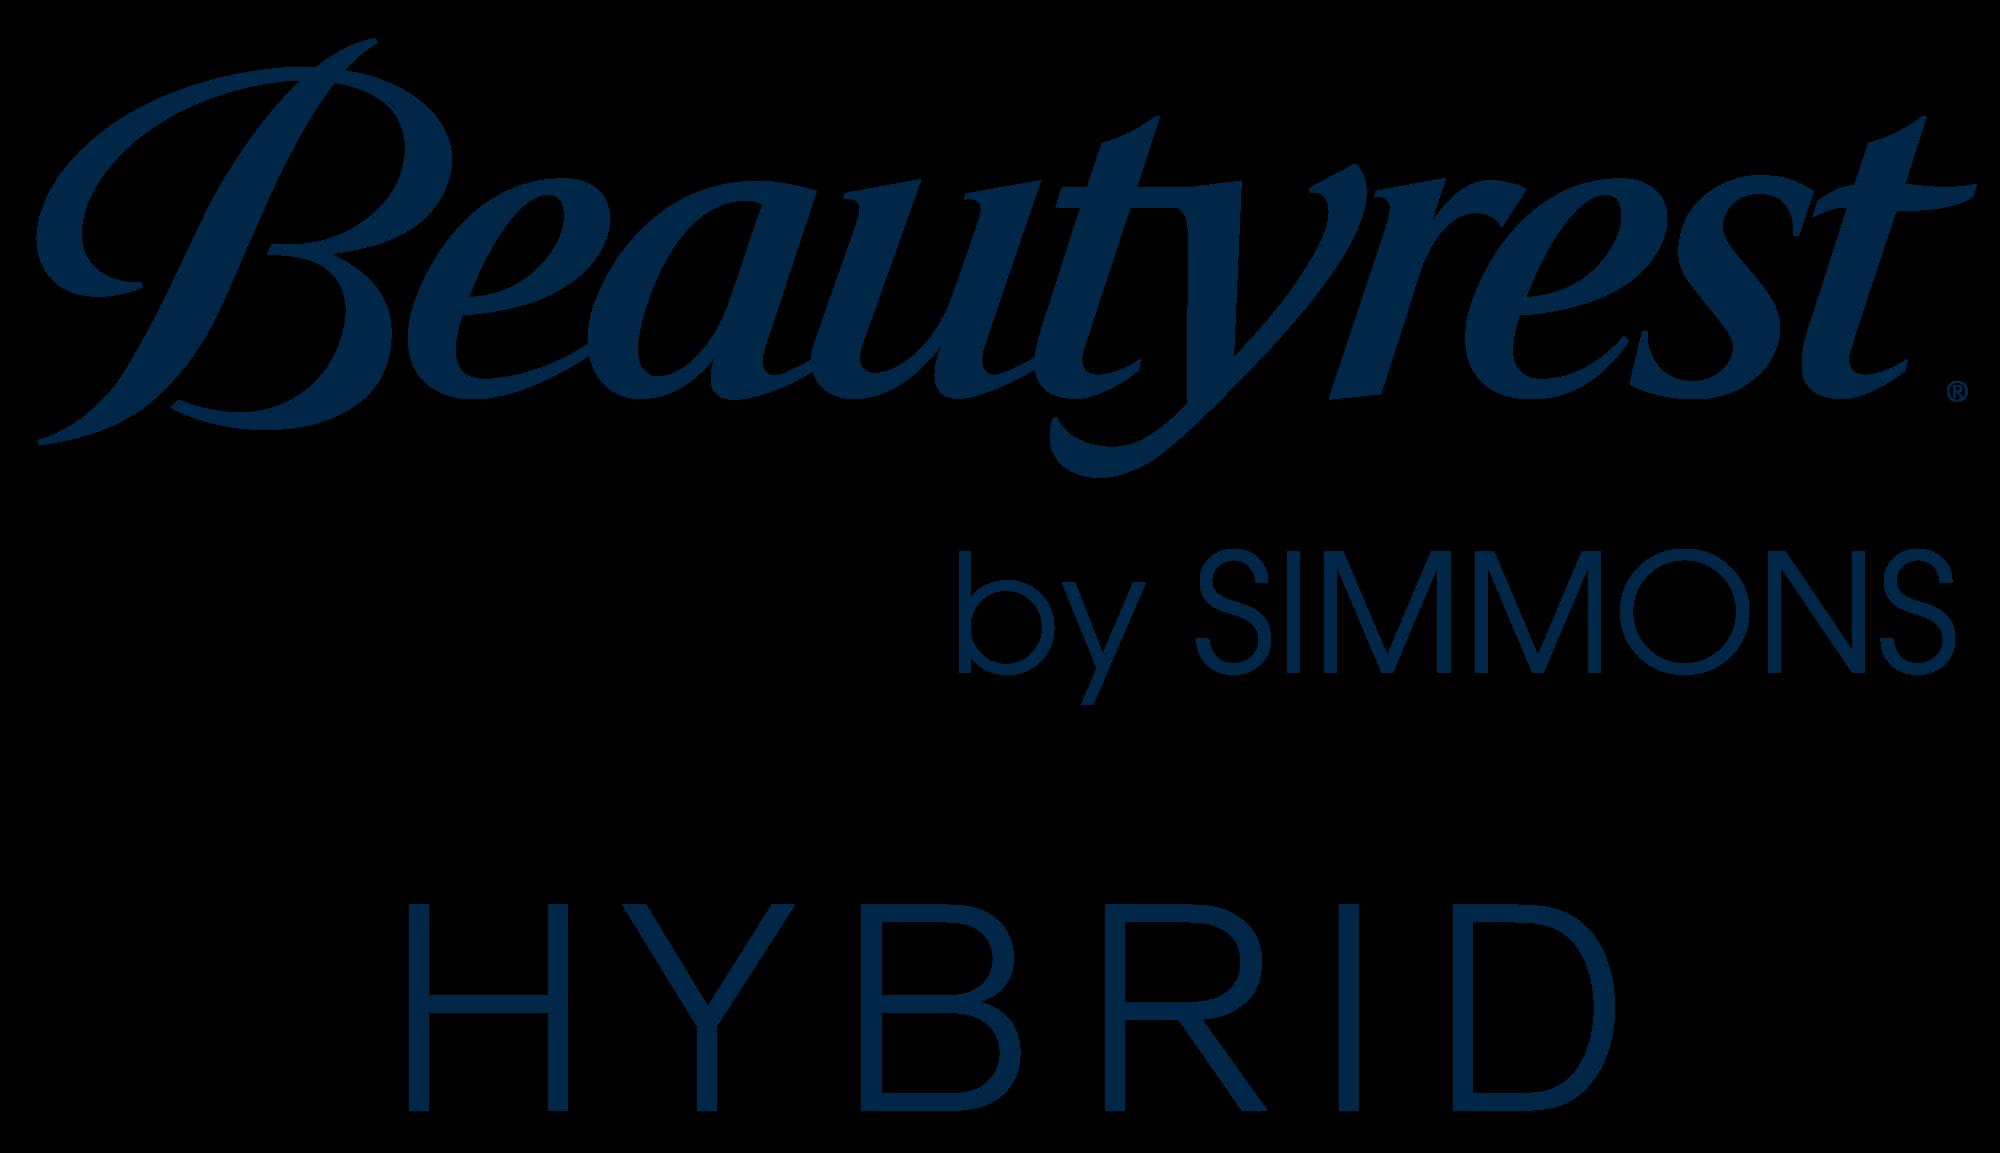 BEAUTYREST_HYBRID_Logo_2019_Marine